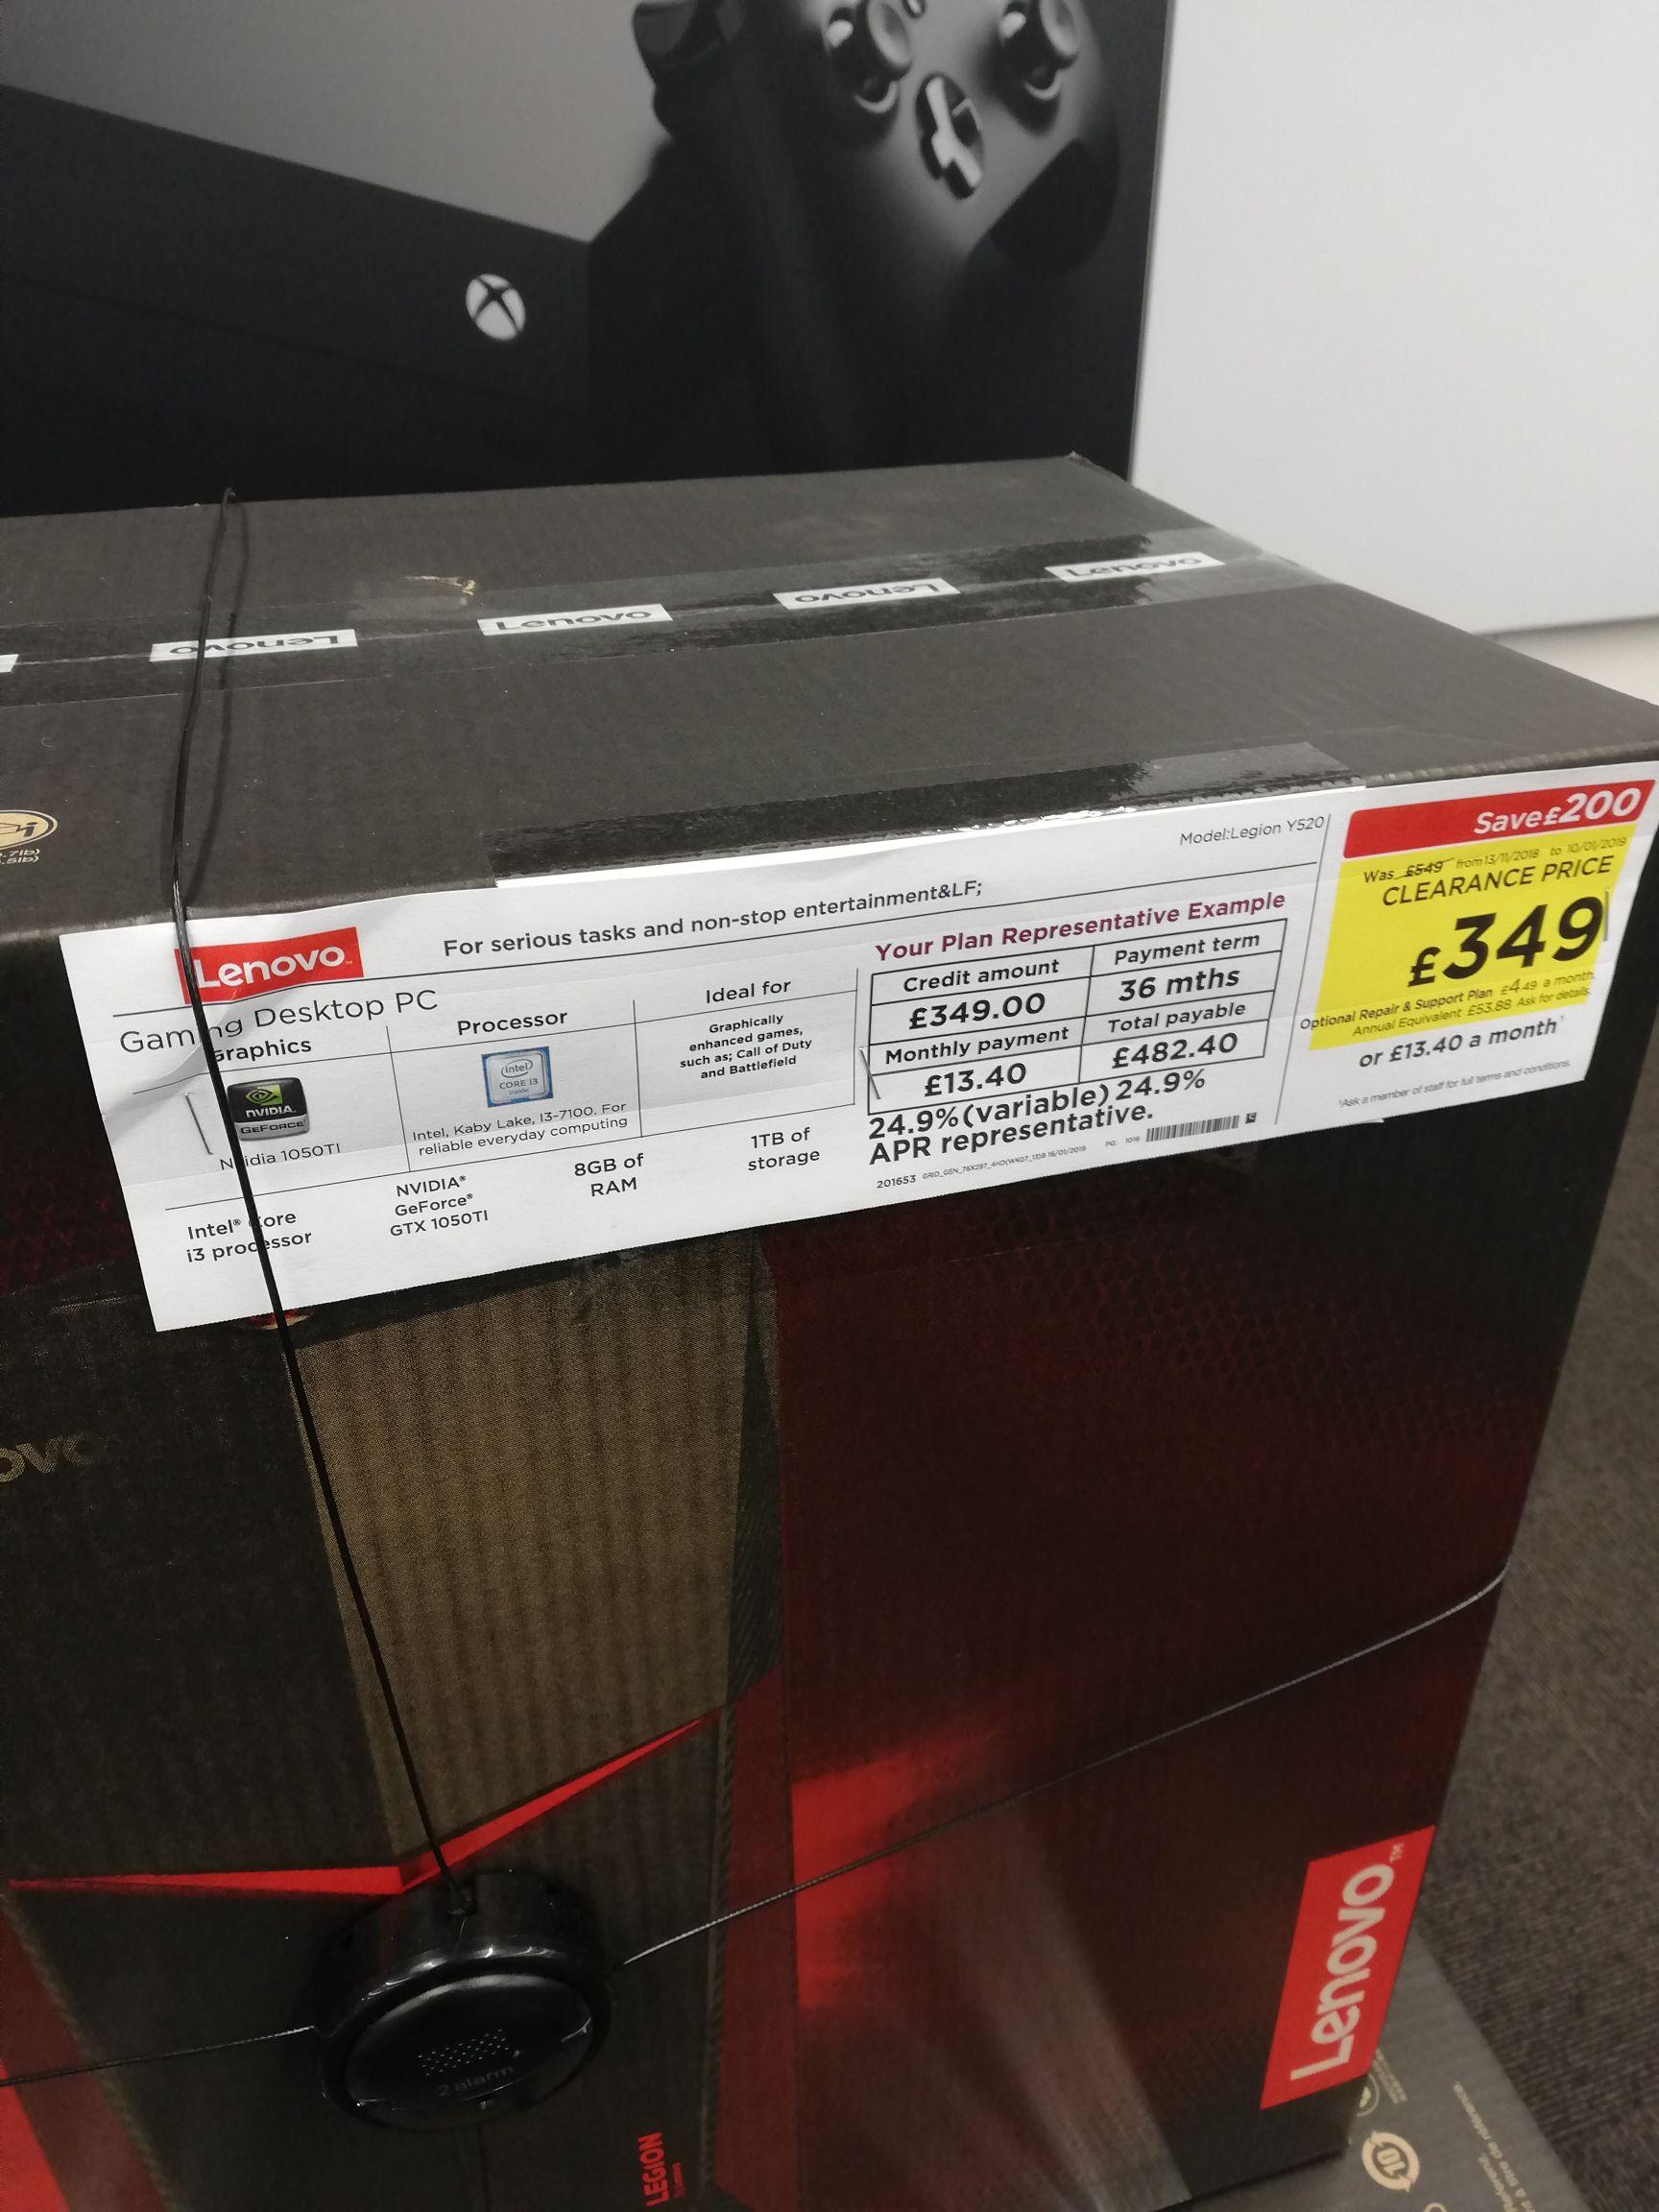 LENOVO LEGION I3 8GB 1TB GTX1050TI DESKTOP GAMING PC£349 @ Currys instore